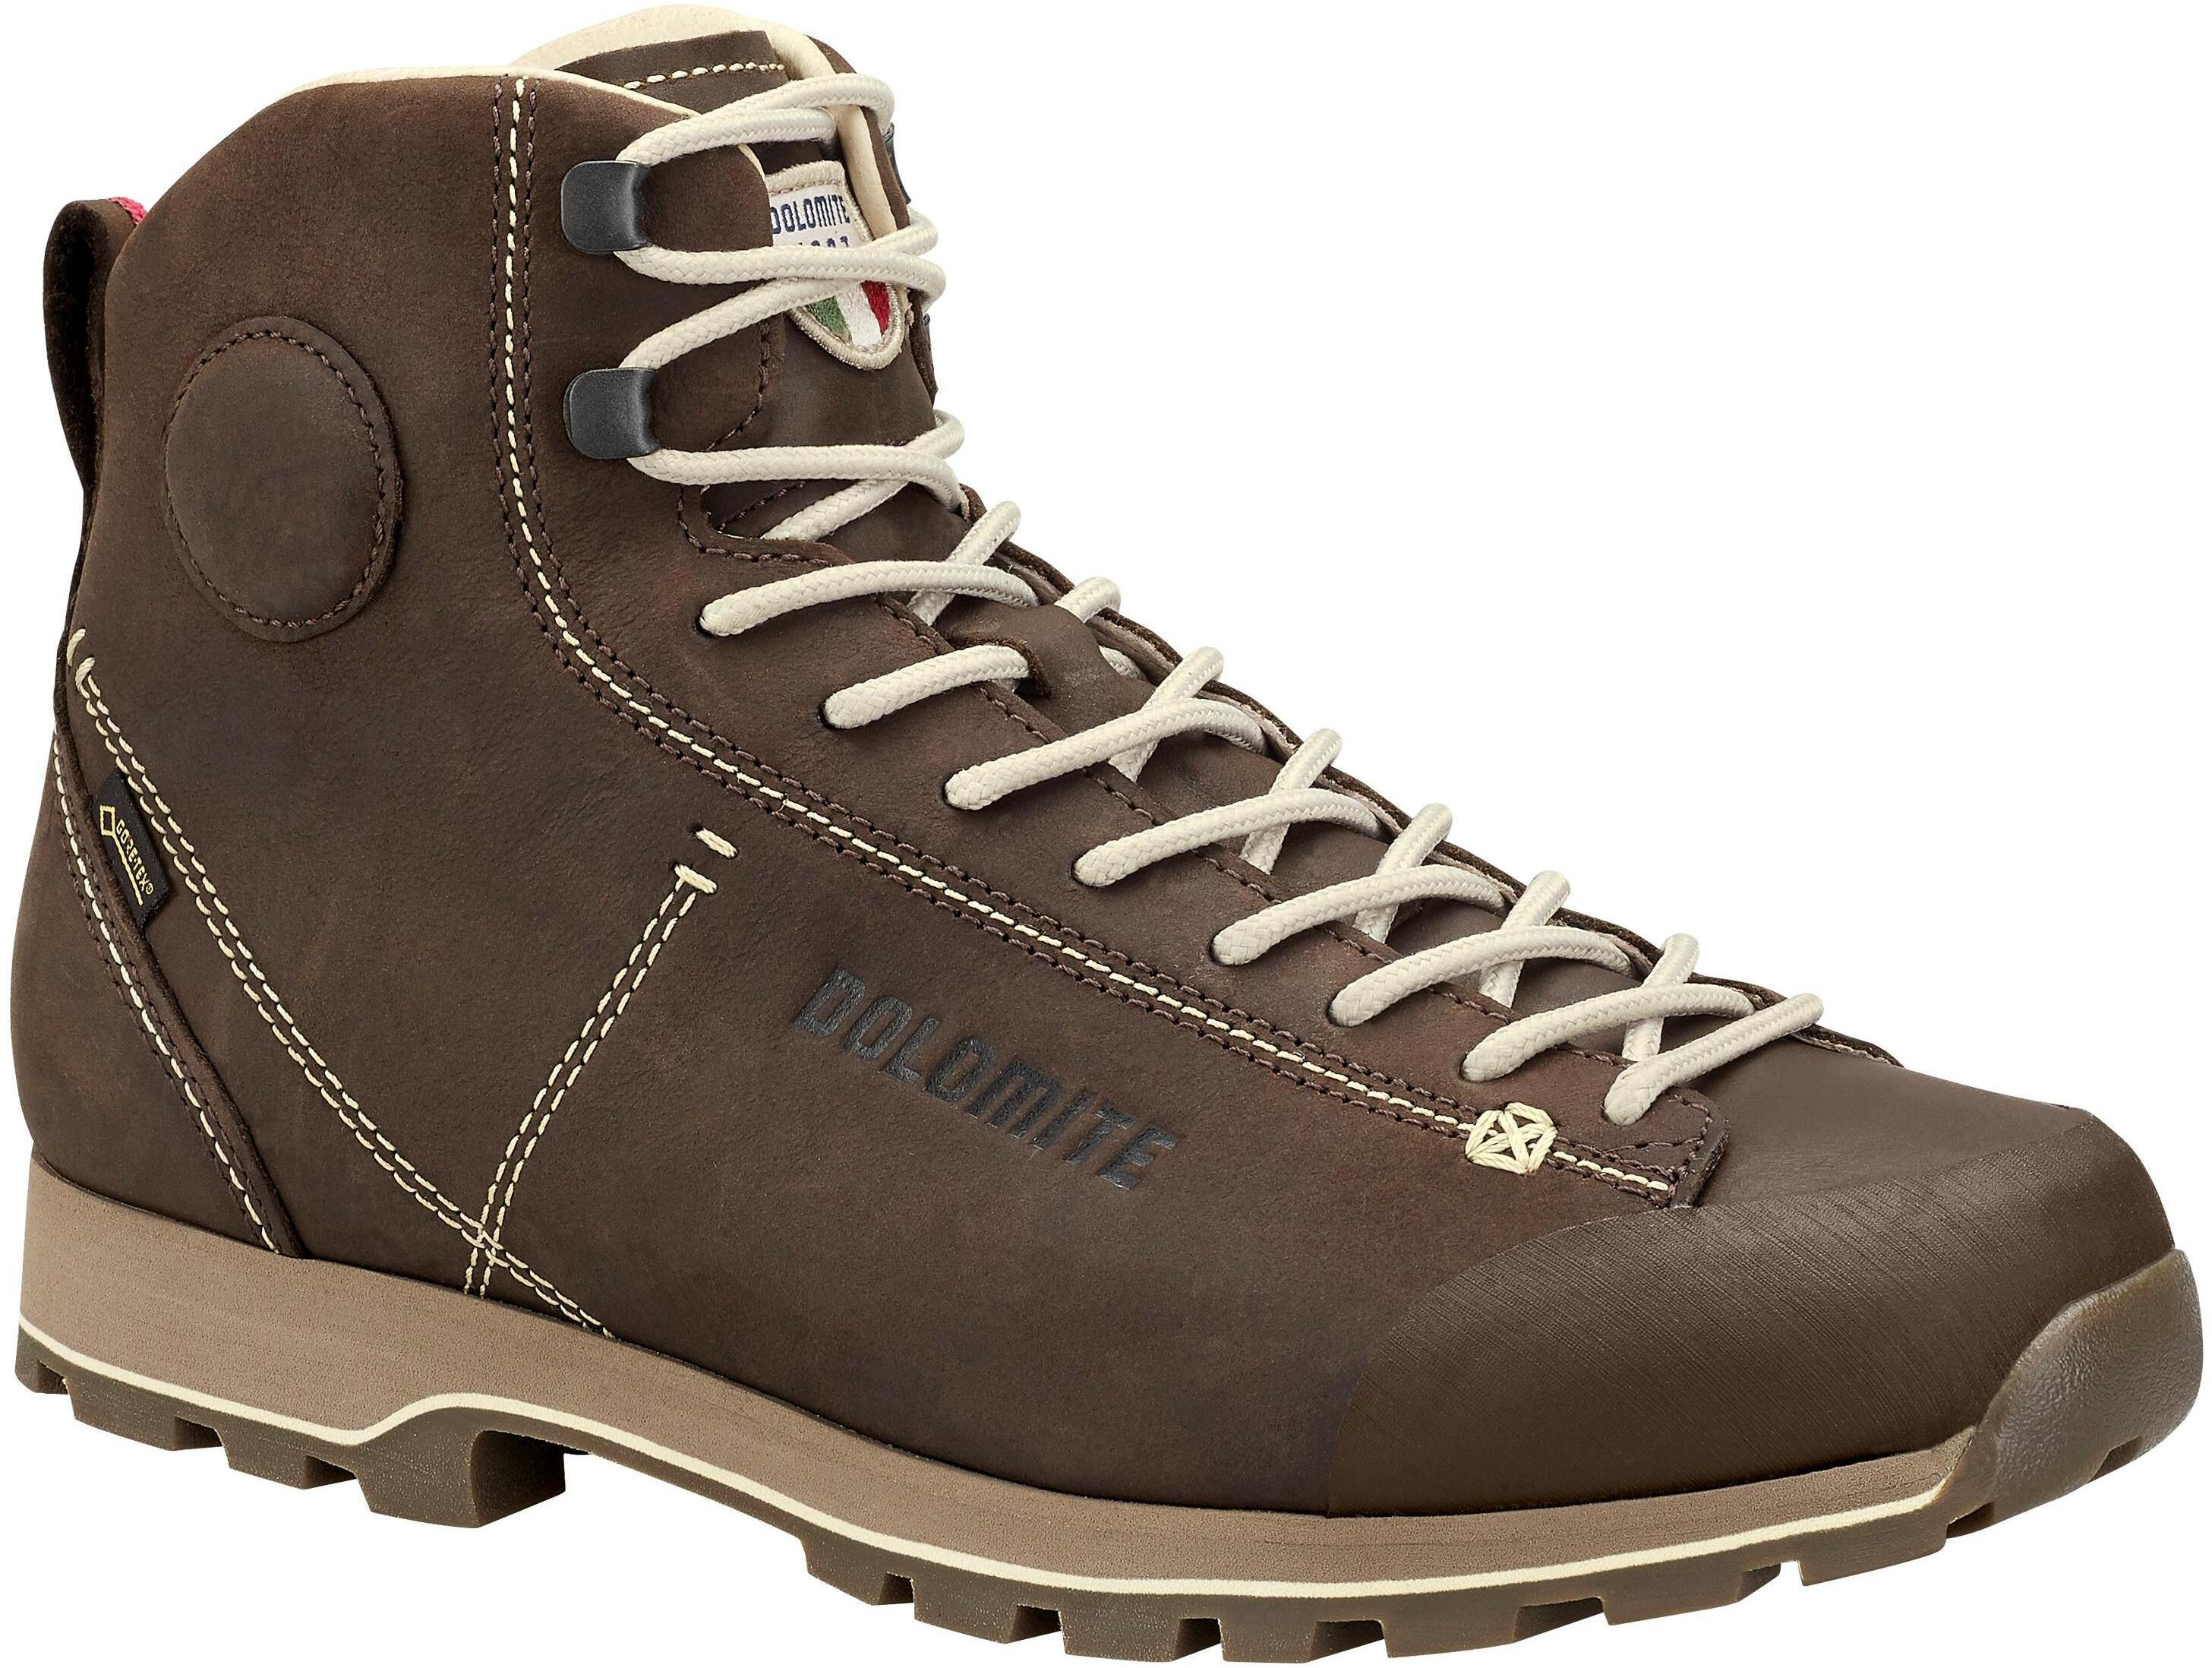 Ботинки Dolomite 54 High Fg Gtx, testa di mor, 12 UK